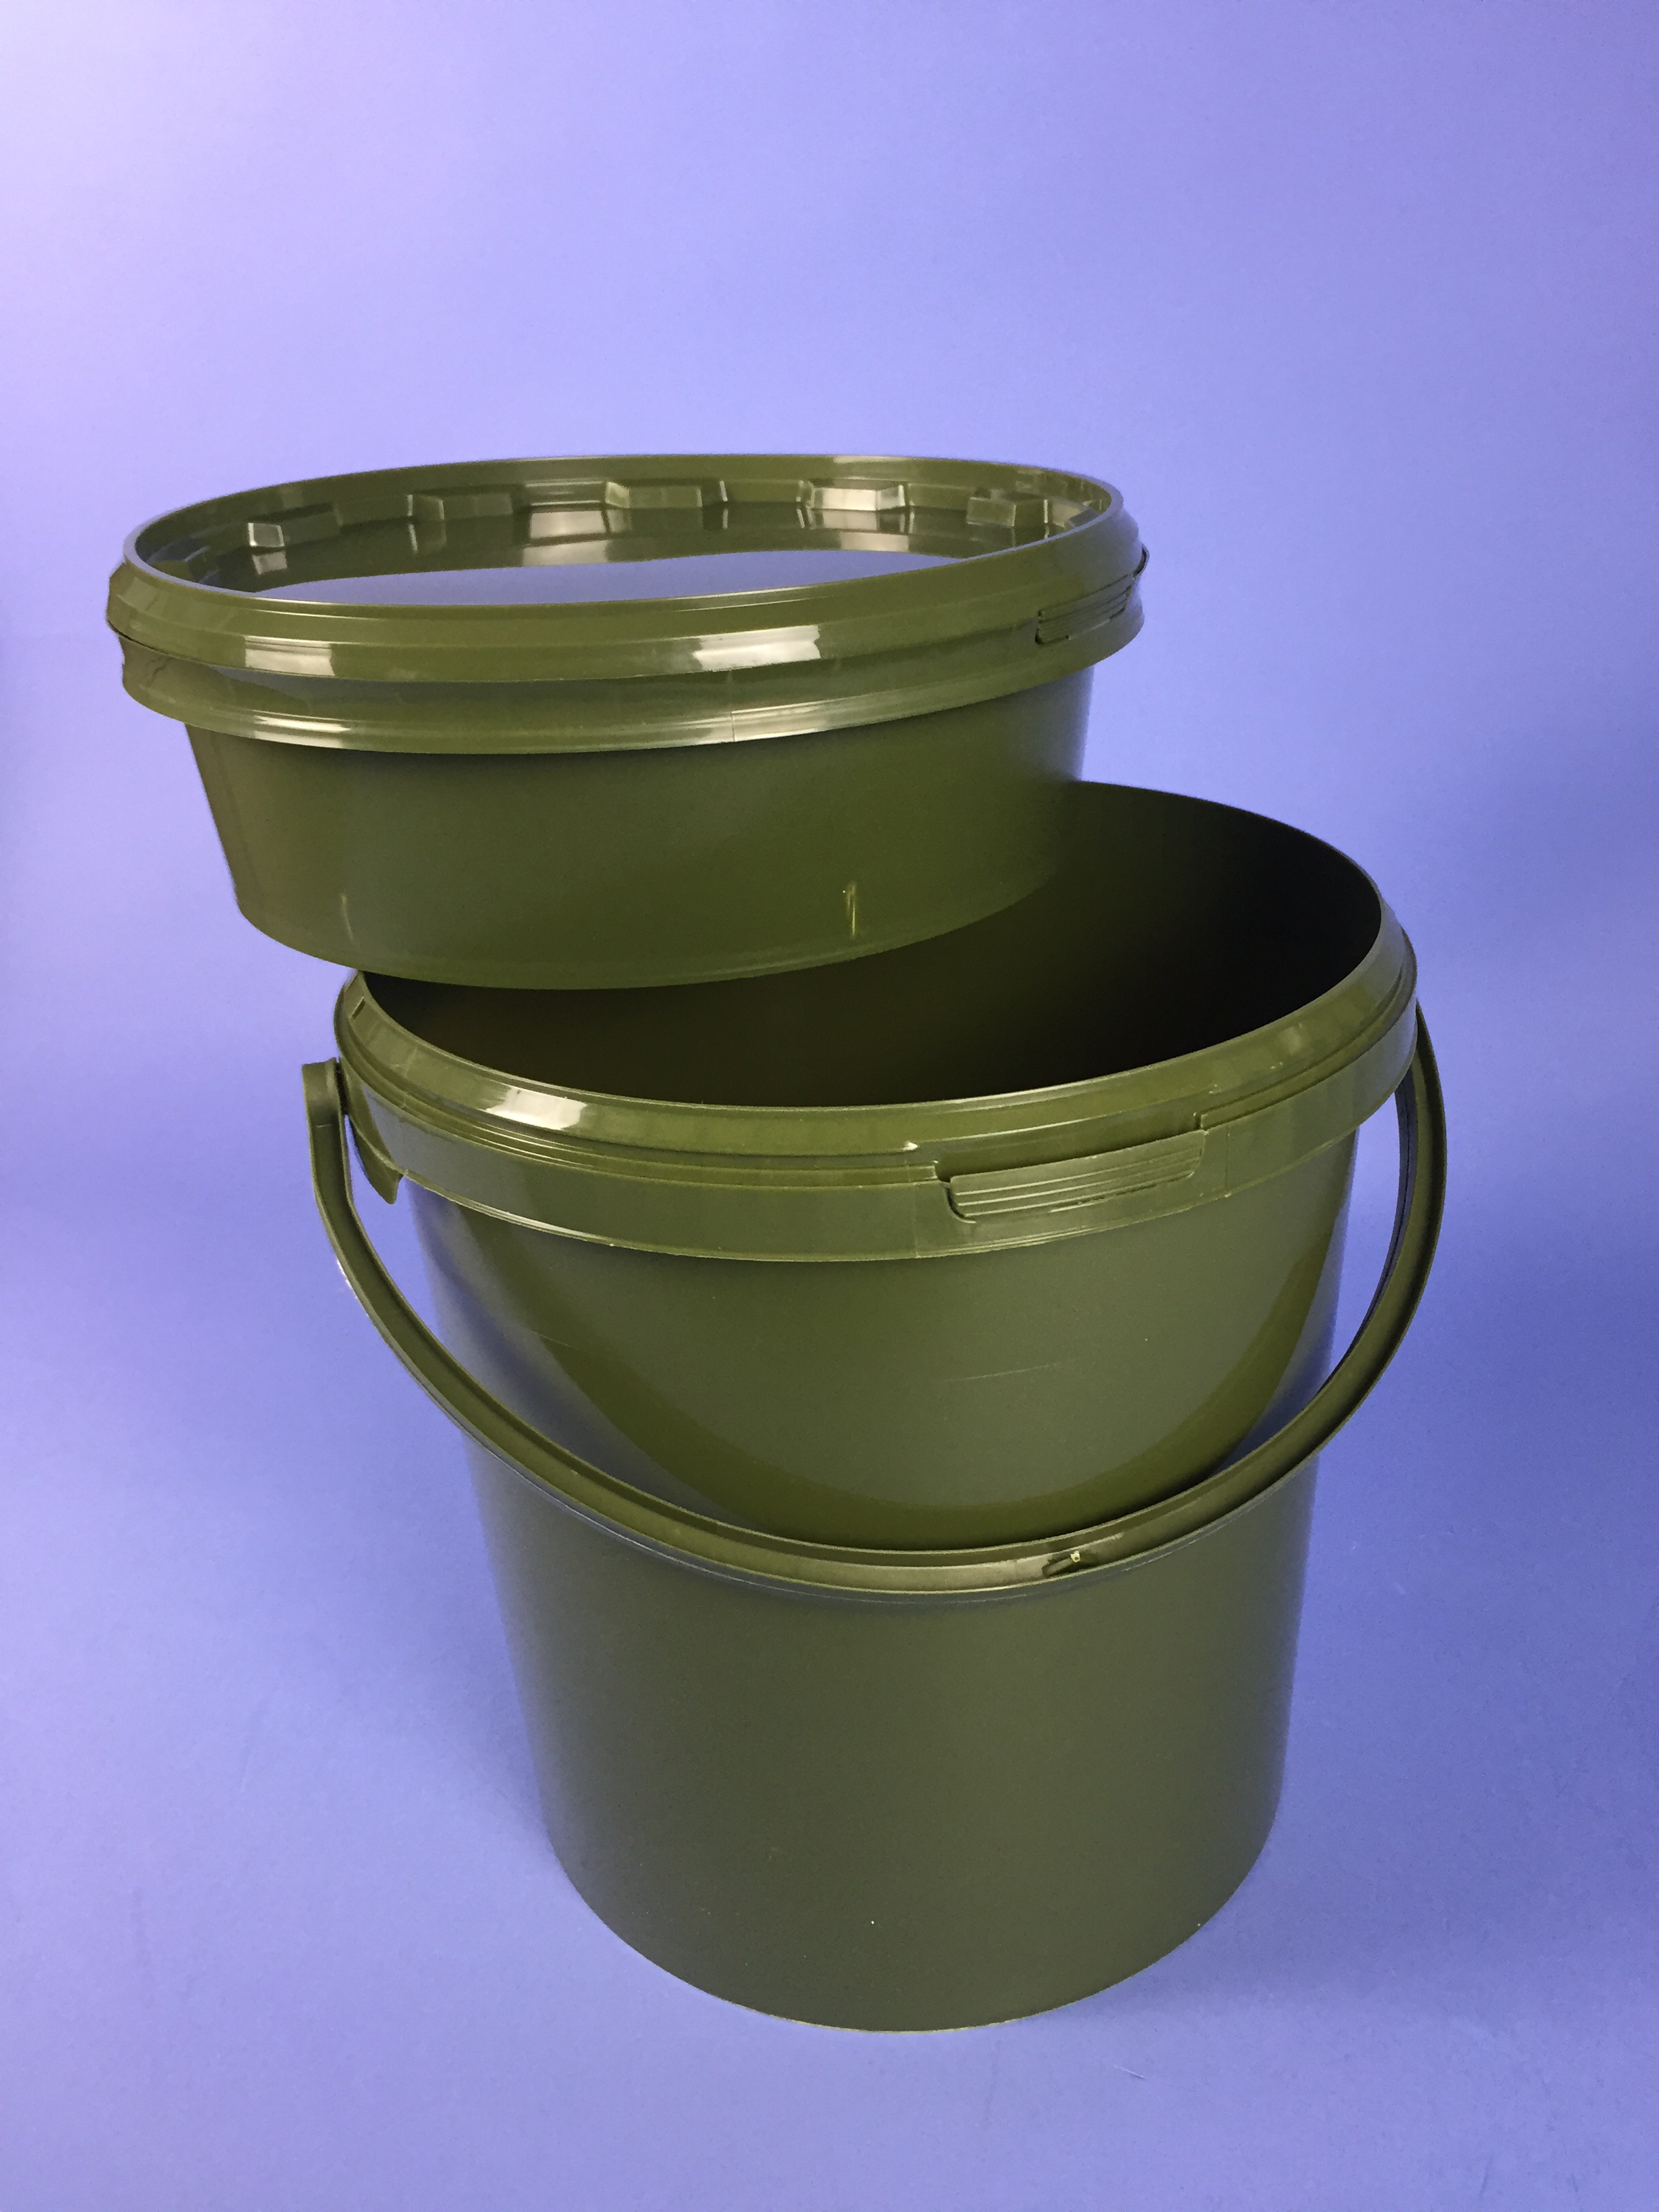 Olive Green 10 7 Litre Bucket C W Plastic Handle Amp Tamper